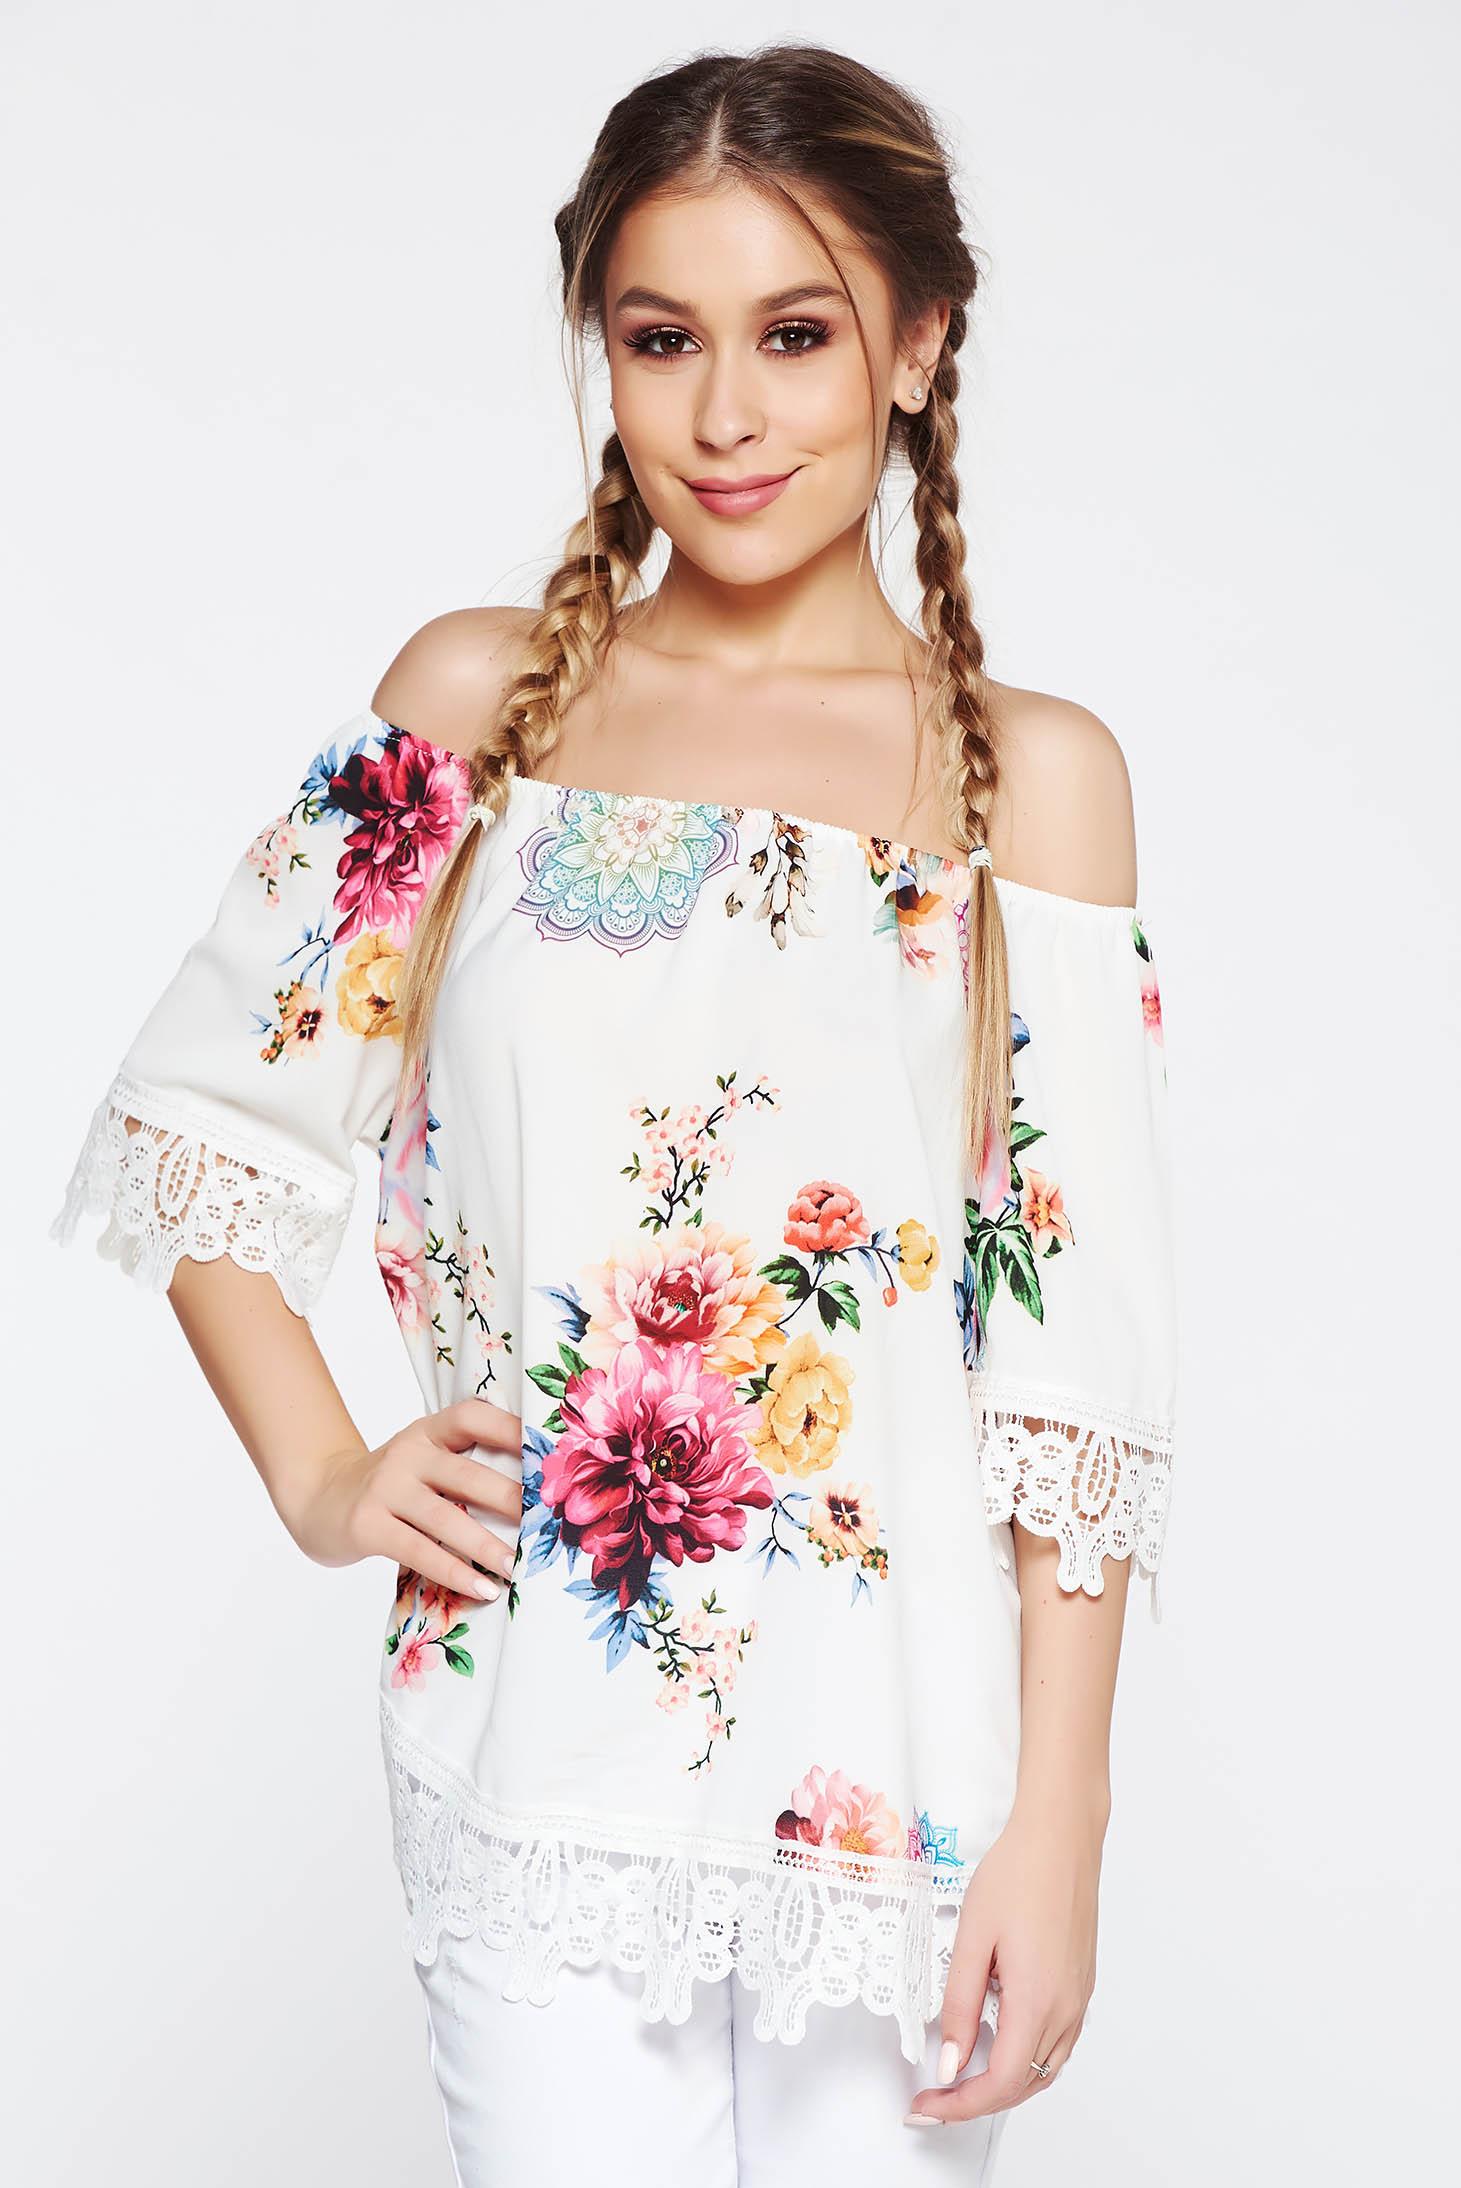 b5a4acb2729 sunshine-white-women`s-blouse-casual-flared-off-sh-S038205-2-372173.jpg